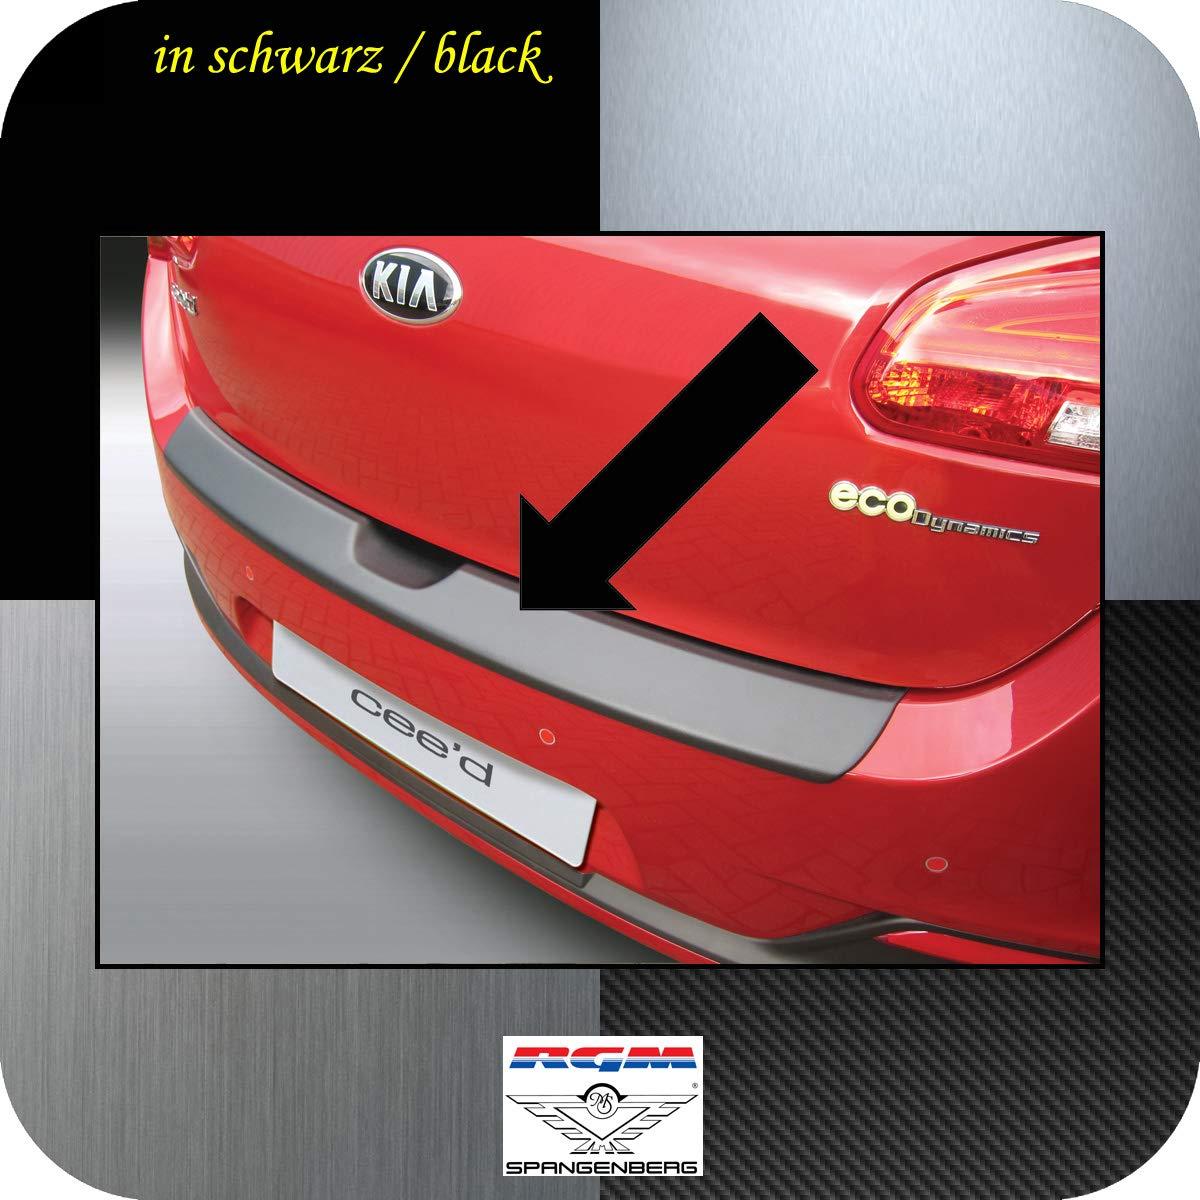 JD Hatchback de 5/Puertas a Partir de a/ño 06.2012/Ceed rbp746 Richard Grant Mouldings Ltd Original RGM ladekant Protecci/ón Negro para Kia CEE d II